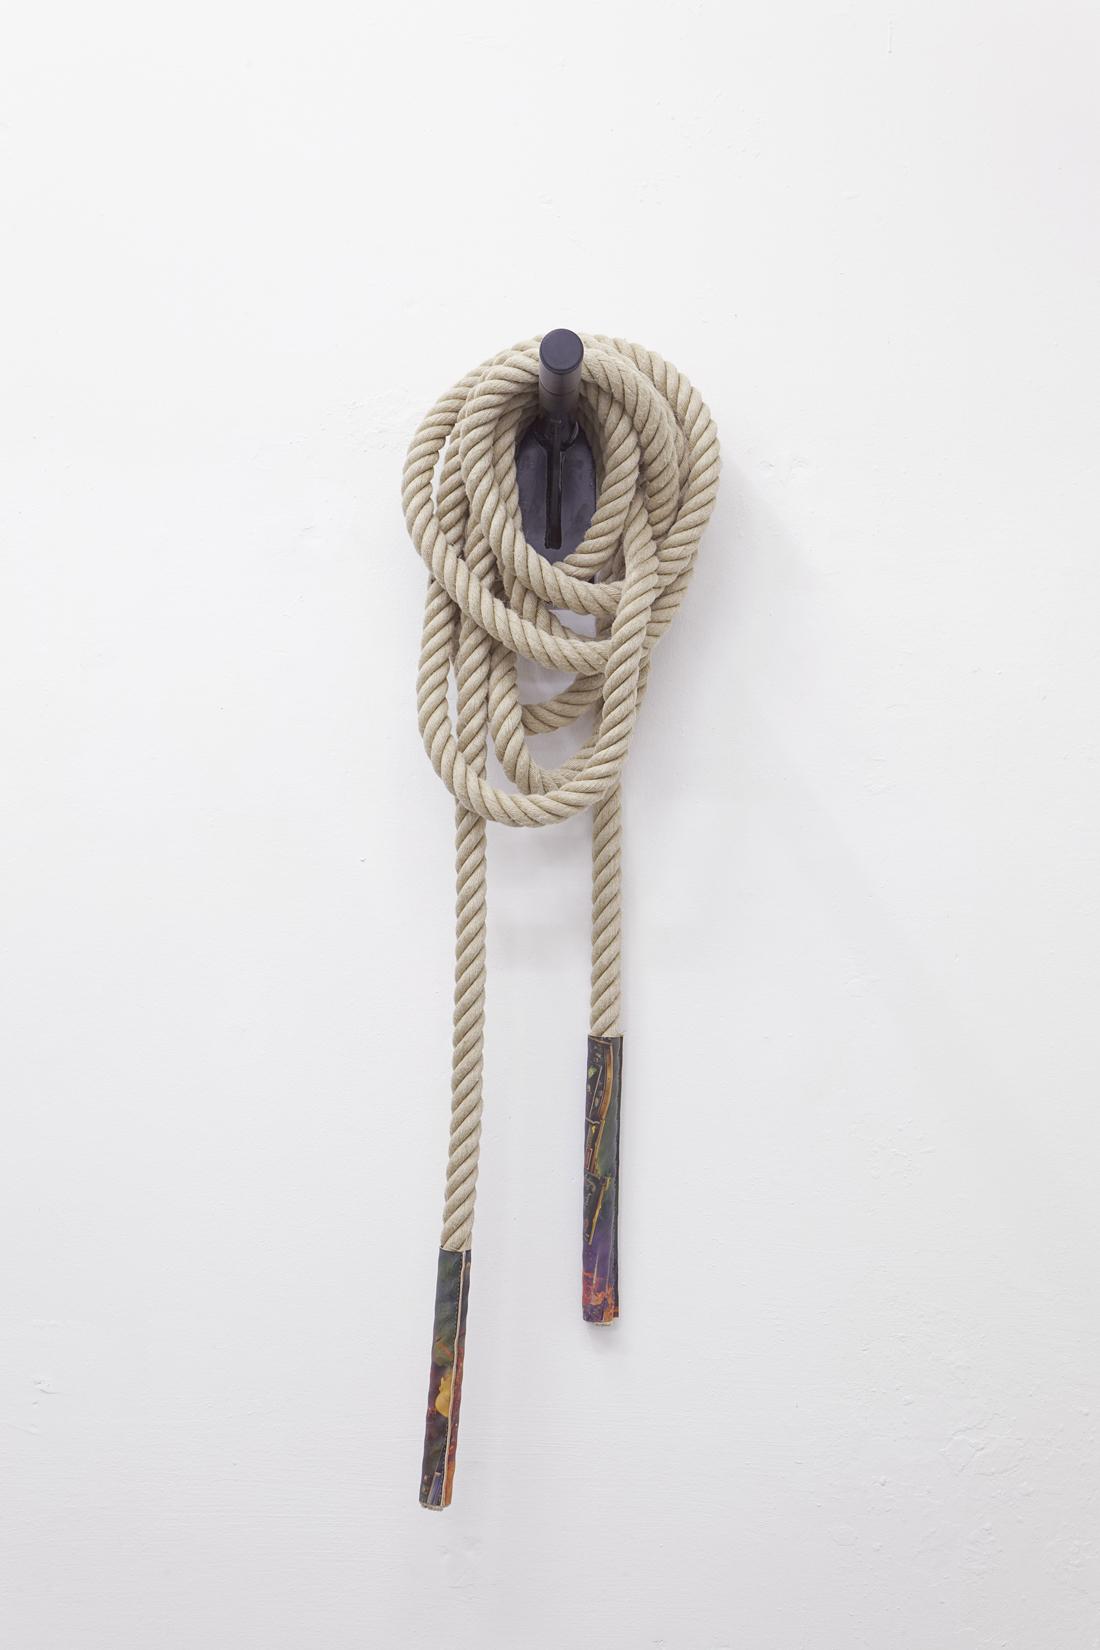 Techies-#11,-Hemprope,-c-print-on-leather,-steel